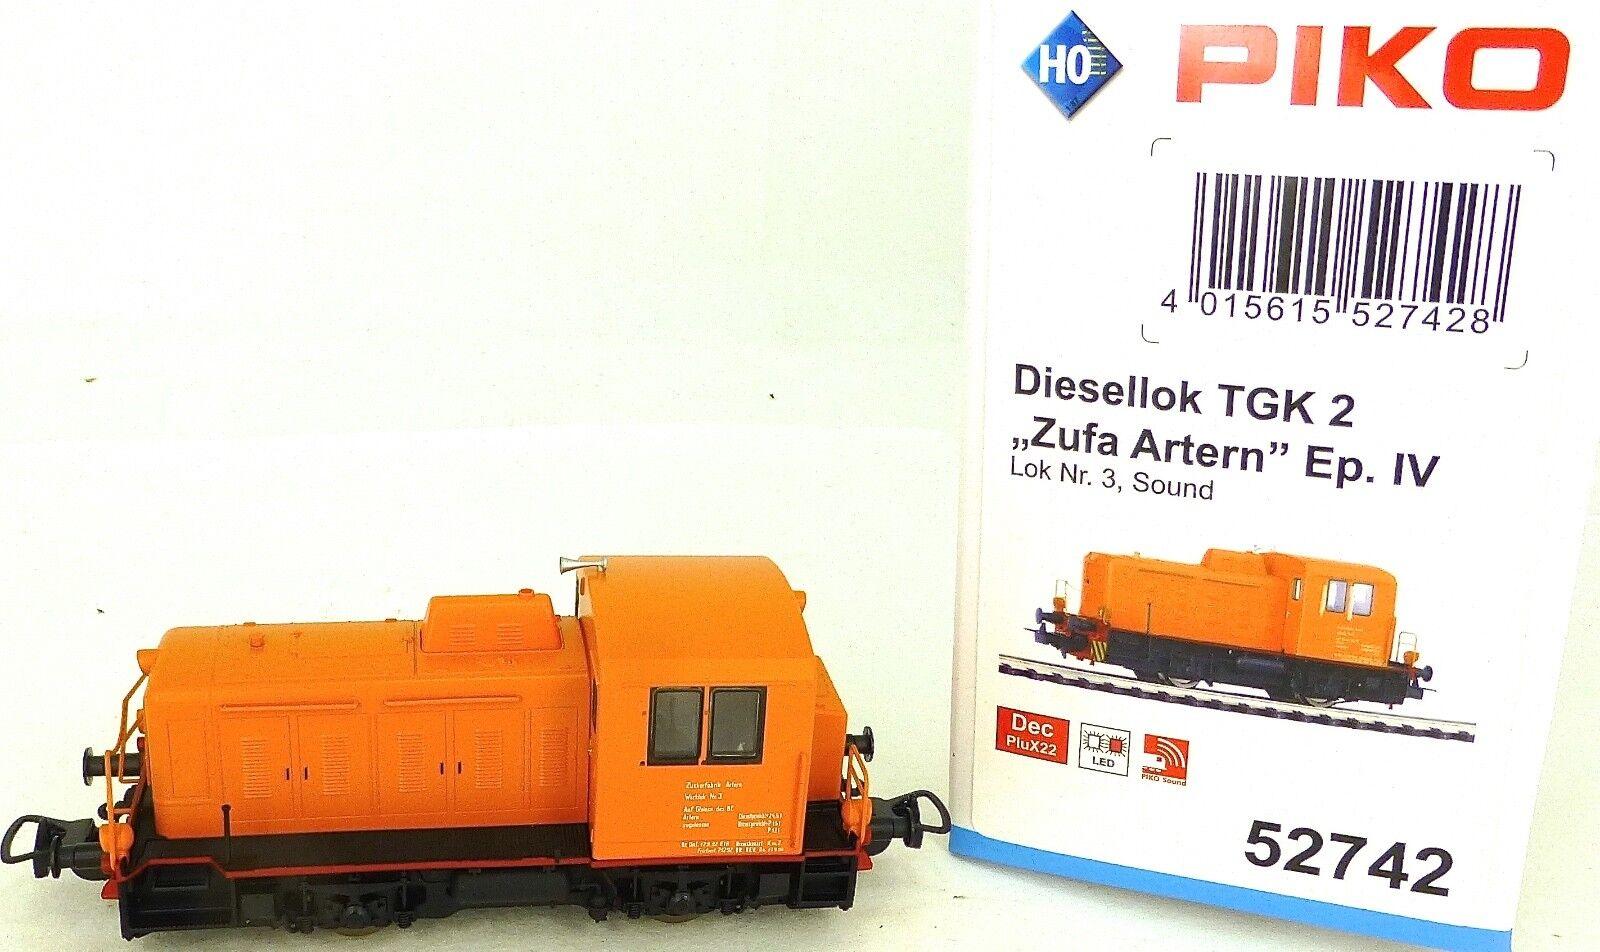 Piko 52742 Locomotive Diesel TGK2 Zufa Artern Son Numérique Ep IV H0 1 87